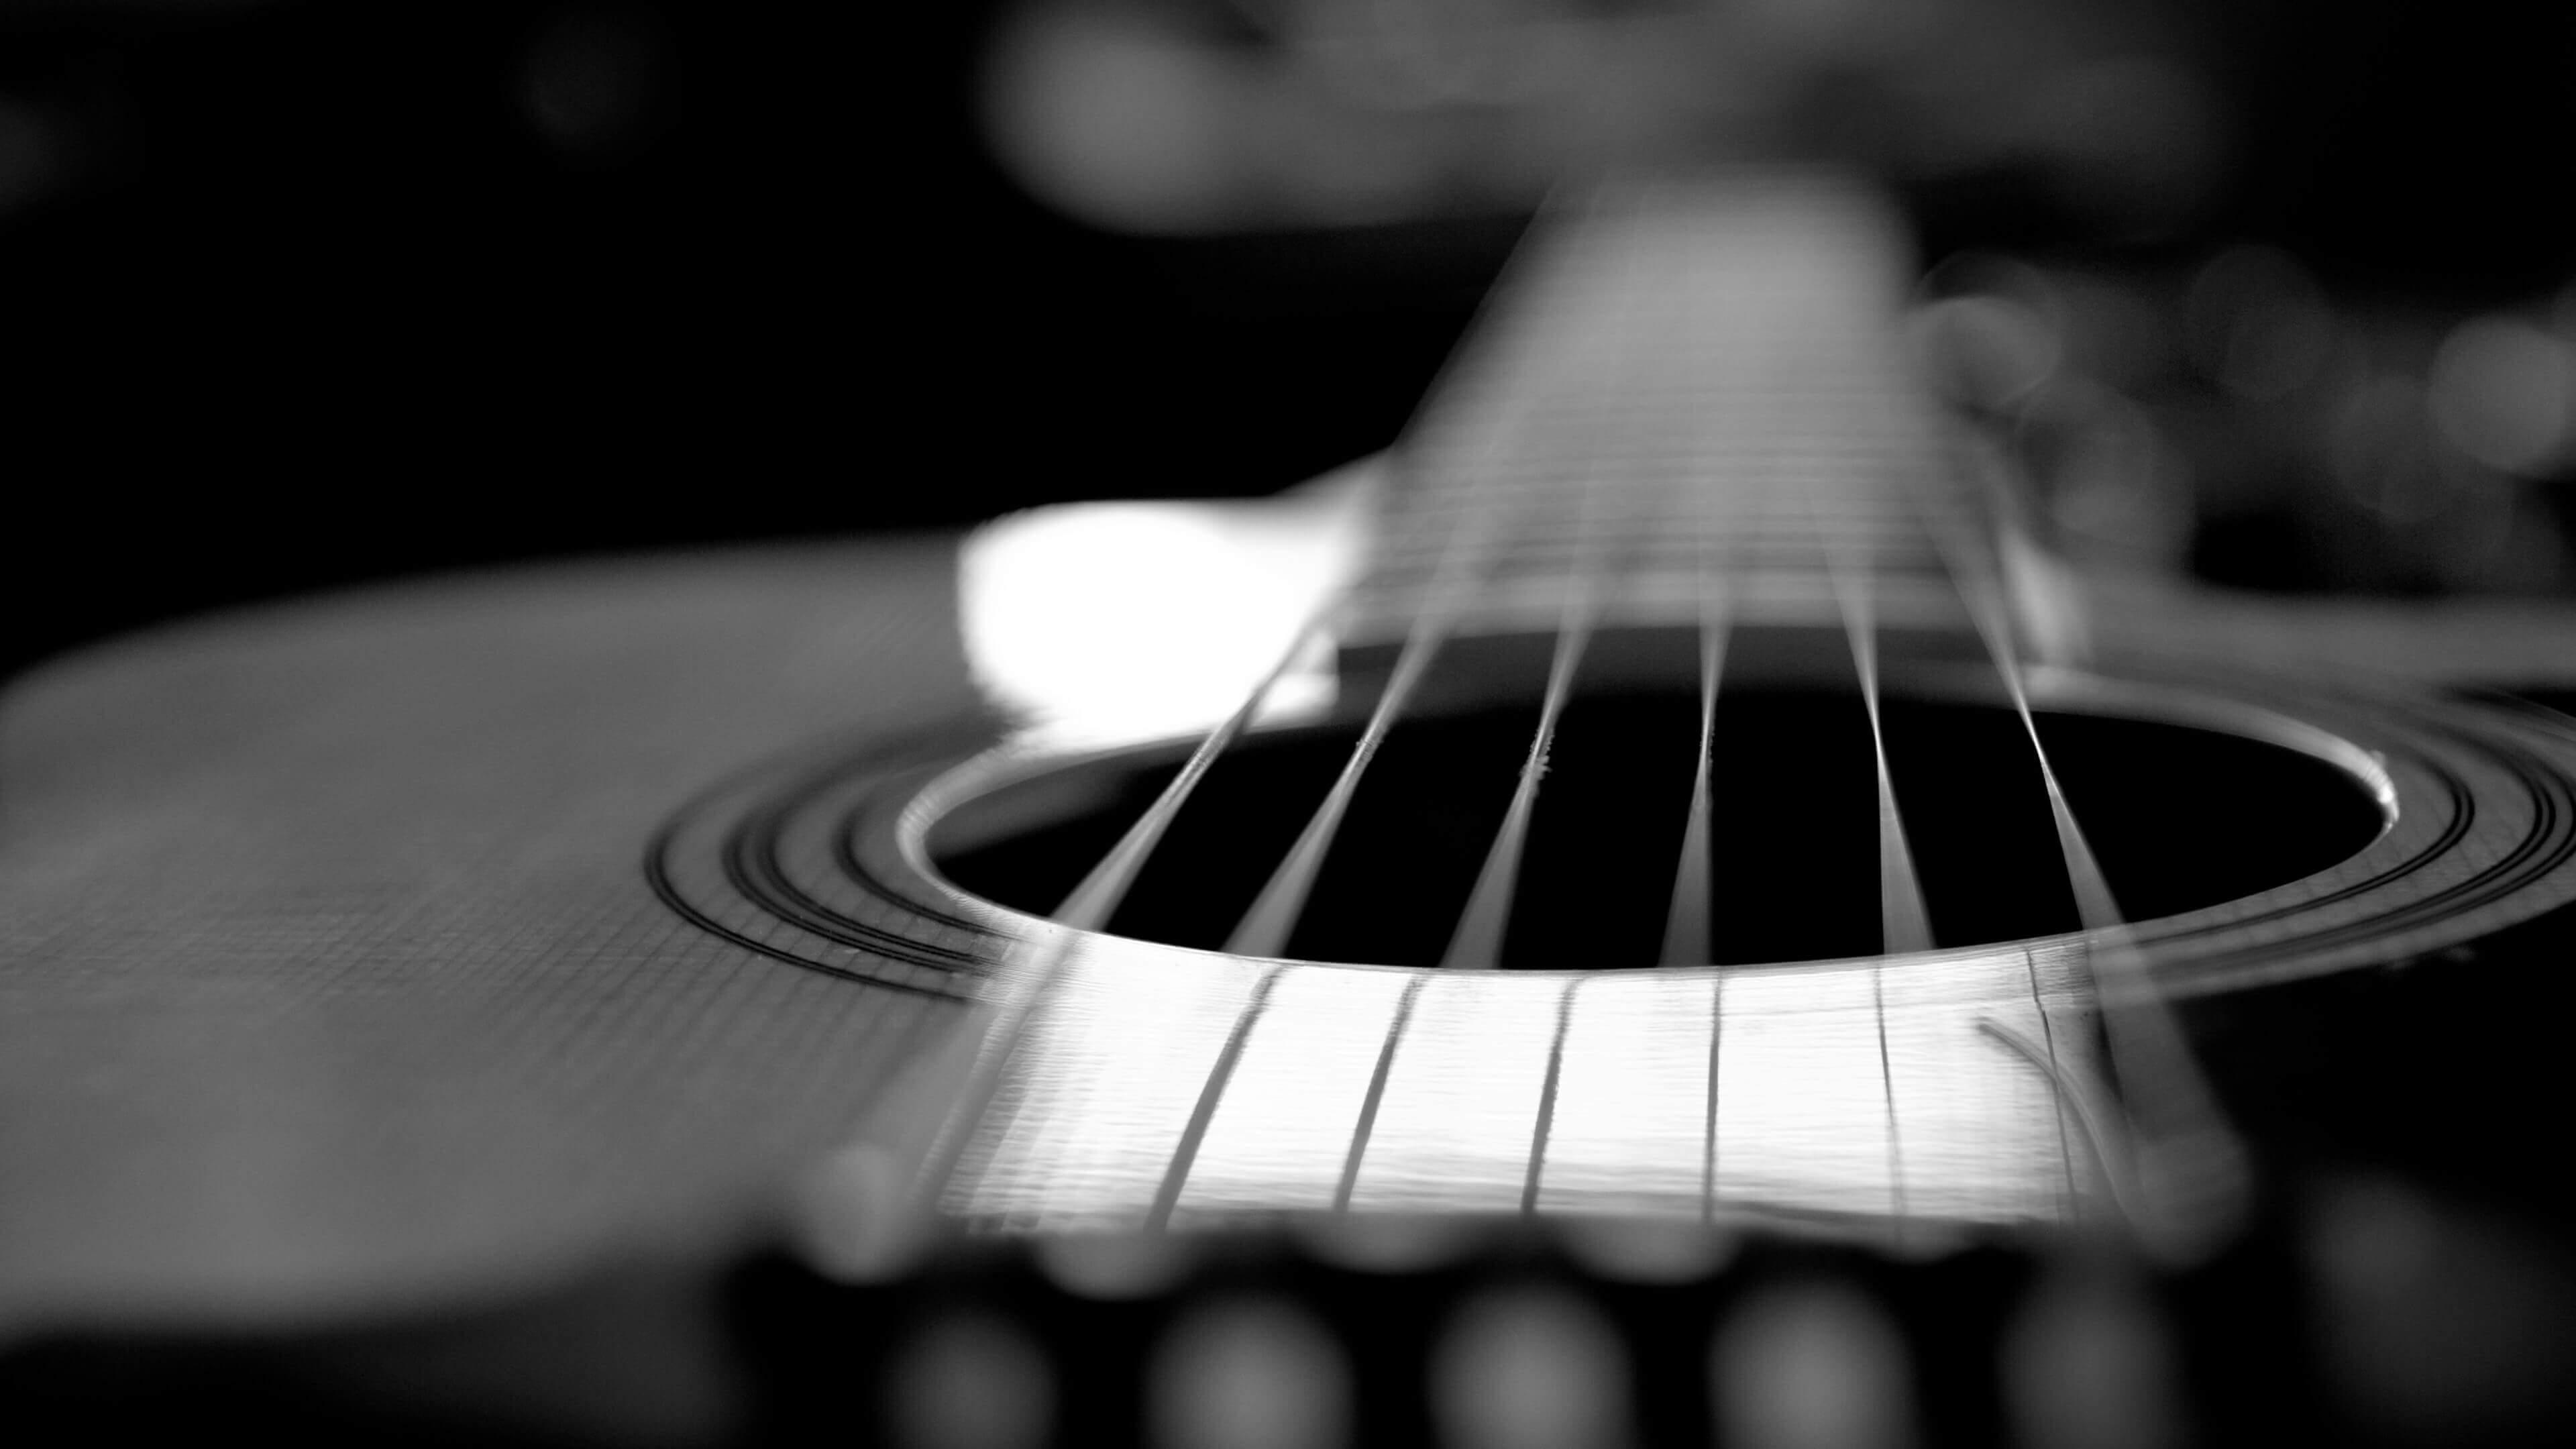 60 acoustic guitar wallpaper Pictures